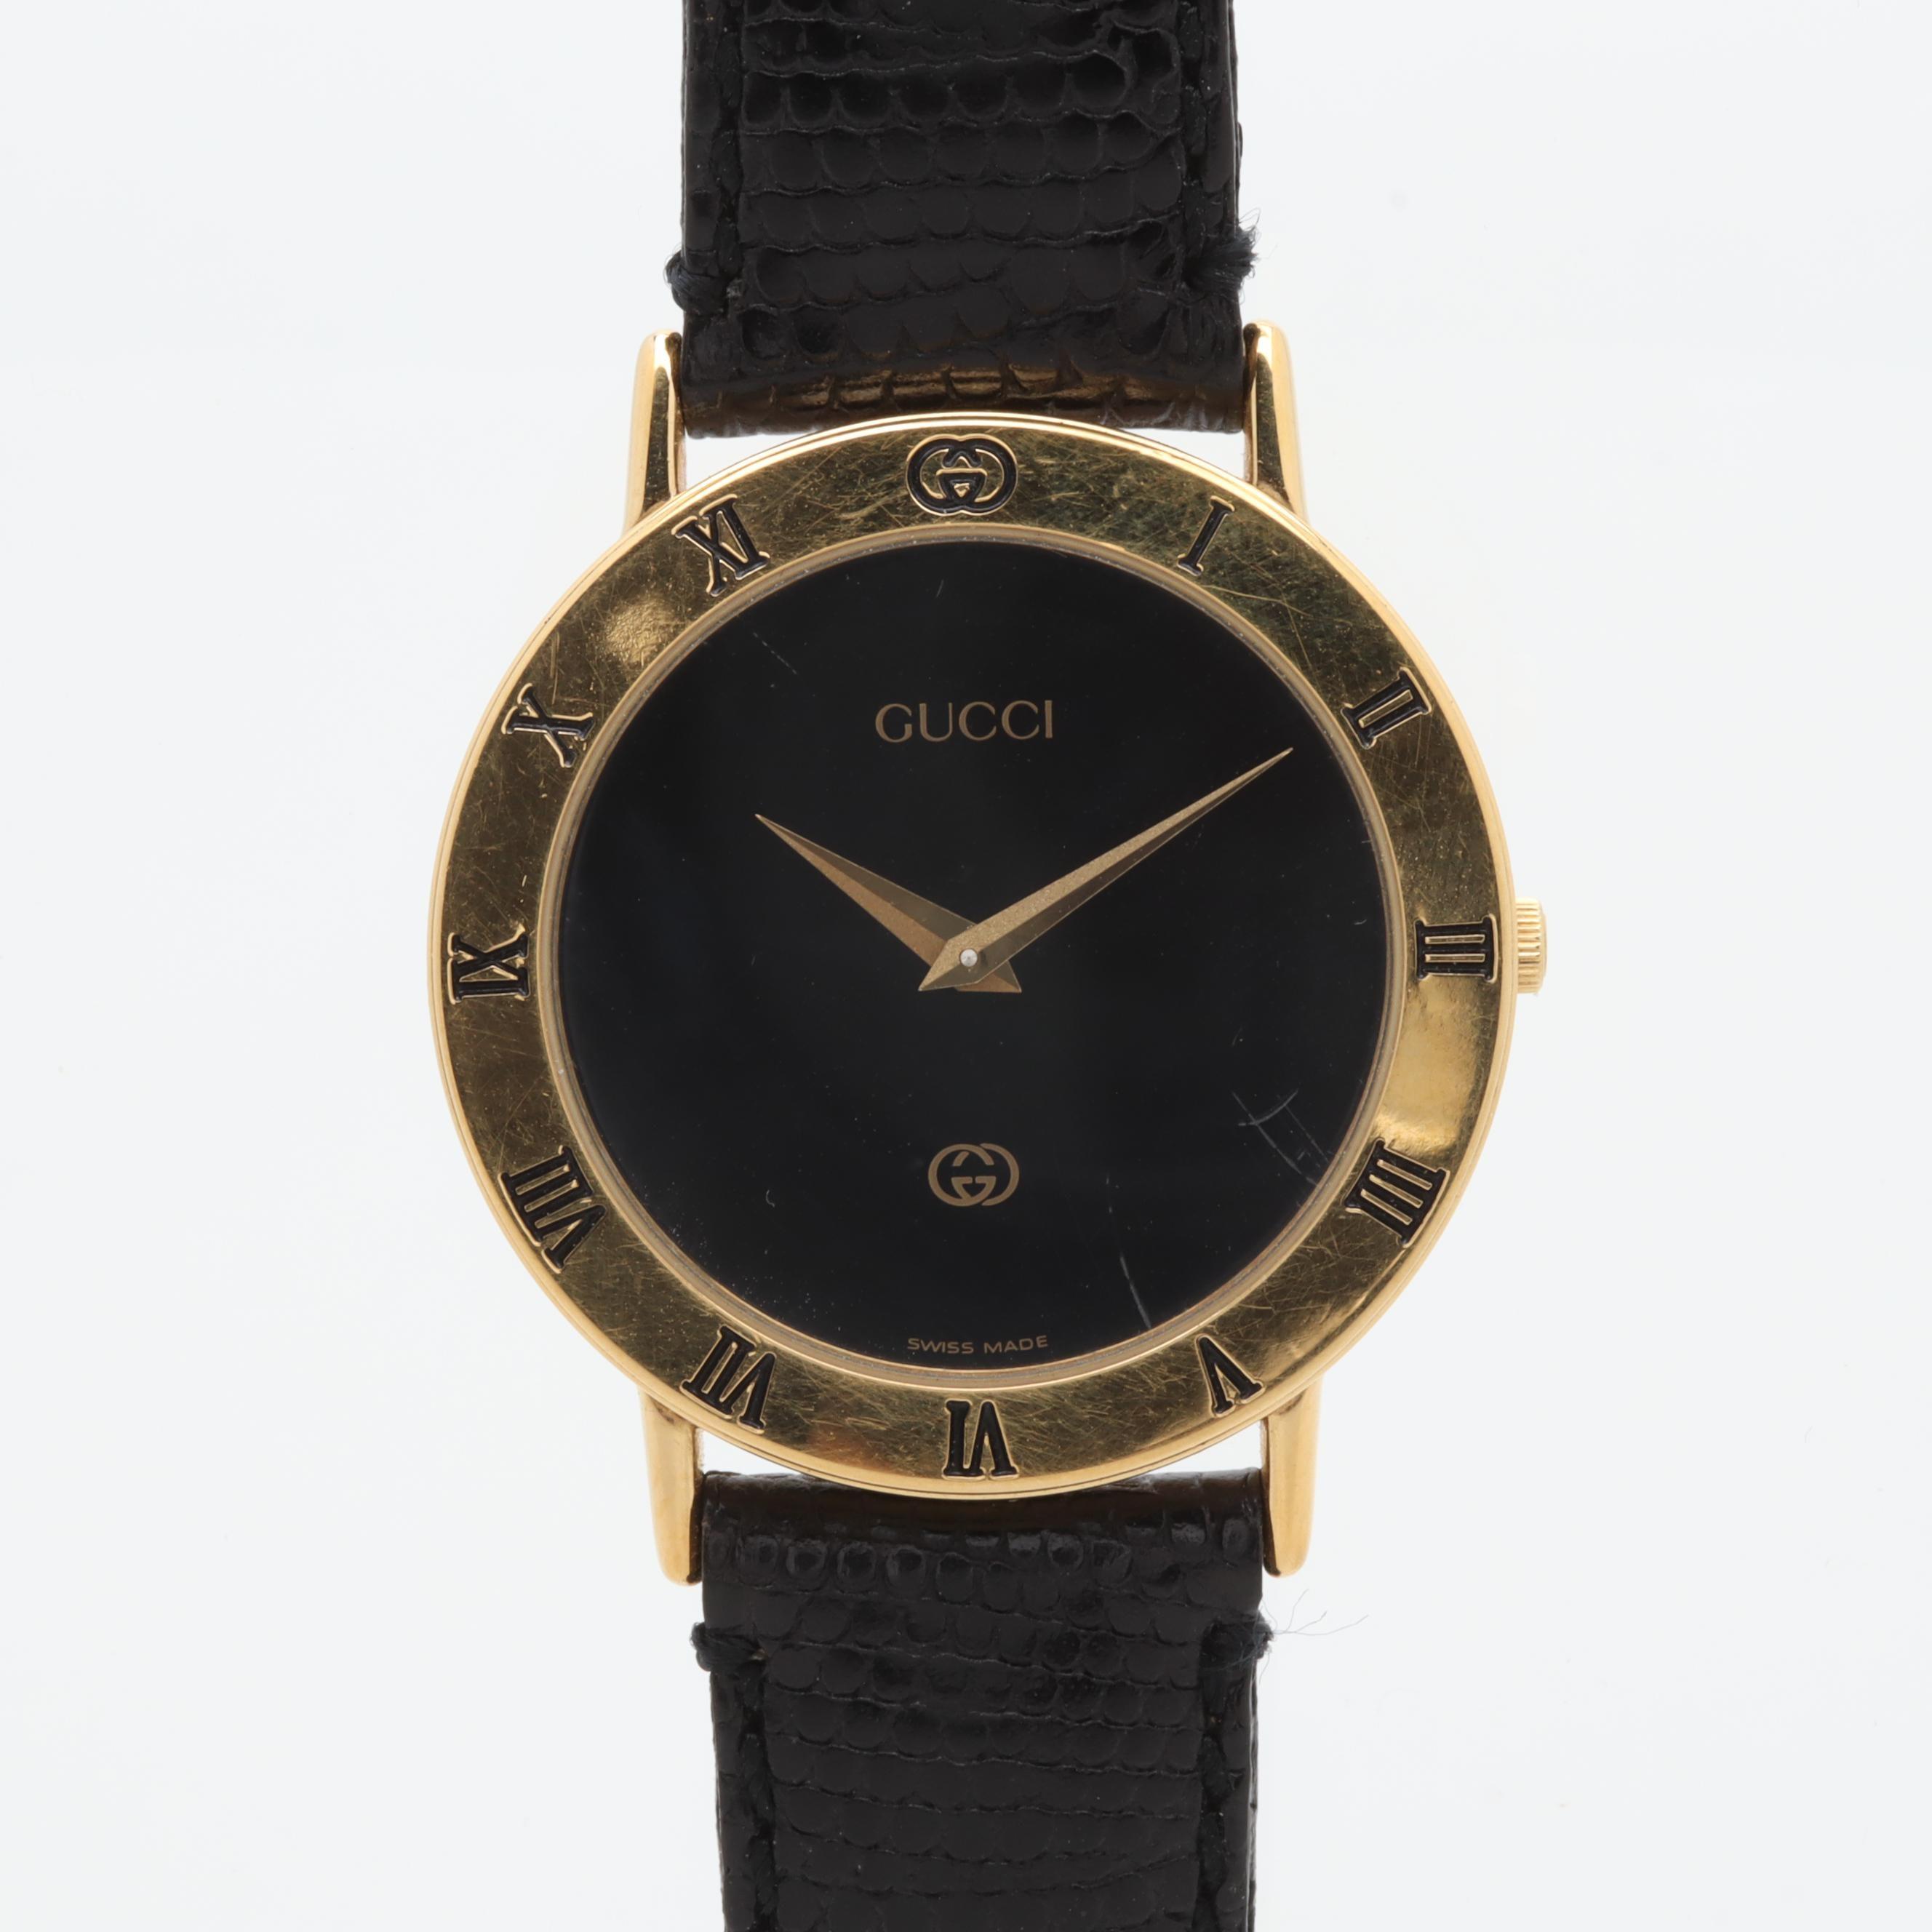 Gucci 3000M Gold Plated Wristwatch